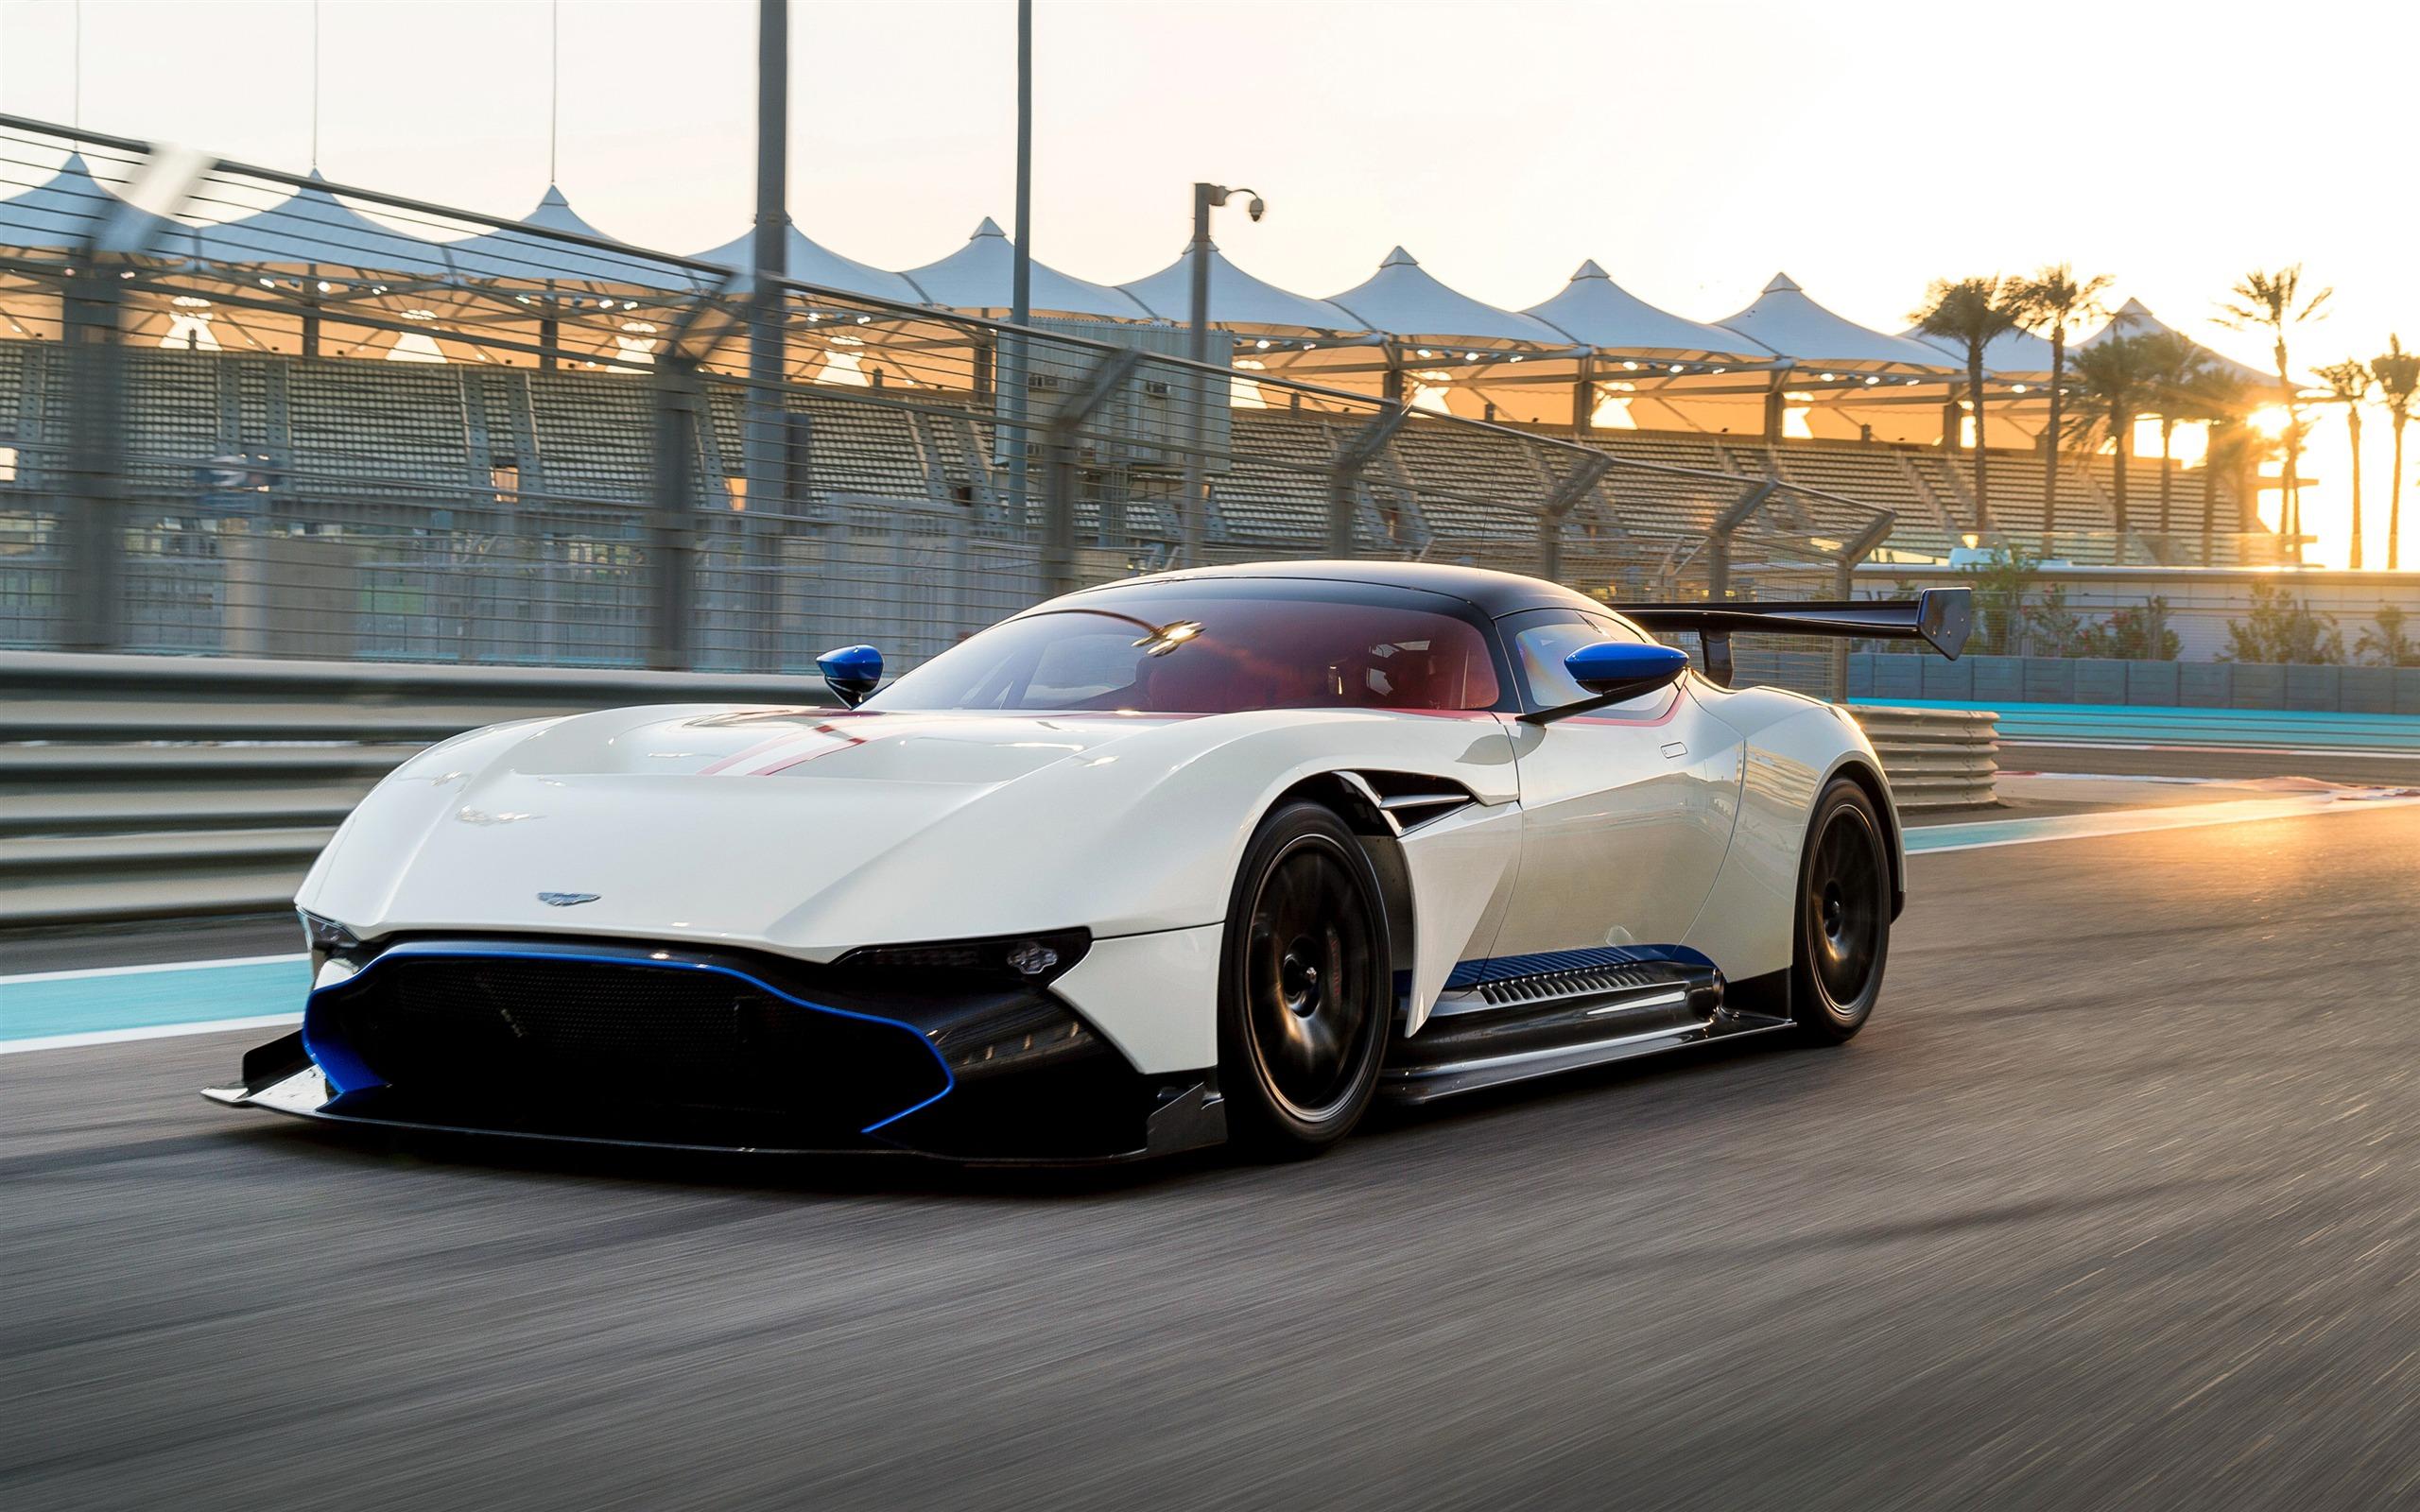 2018 White Aston Martin Vulcan 4k Photo Preview